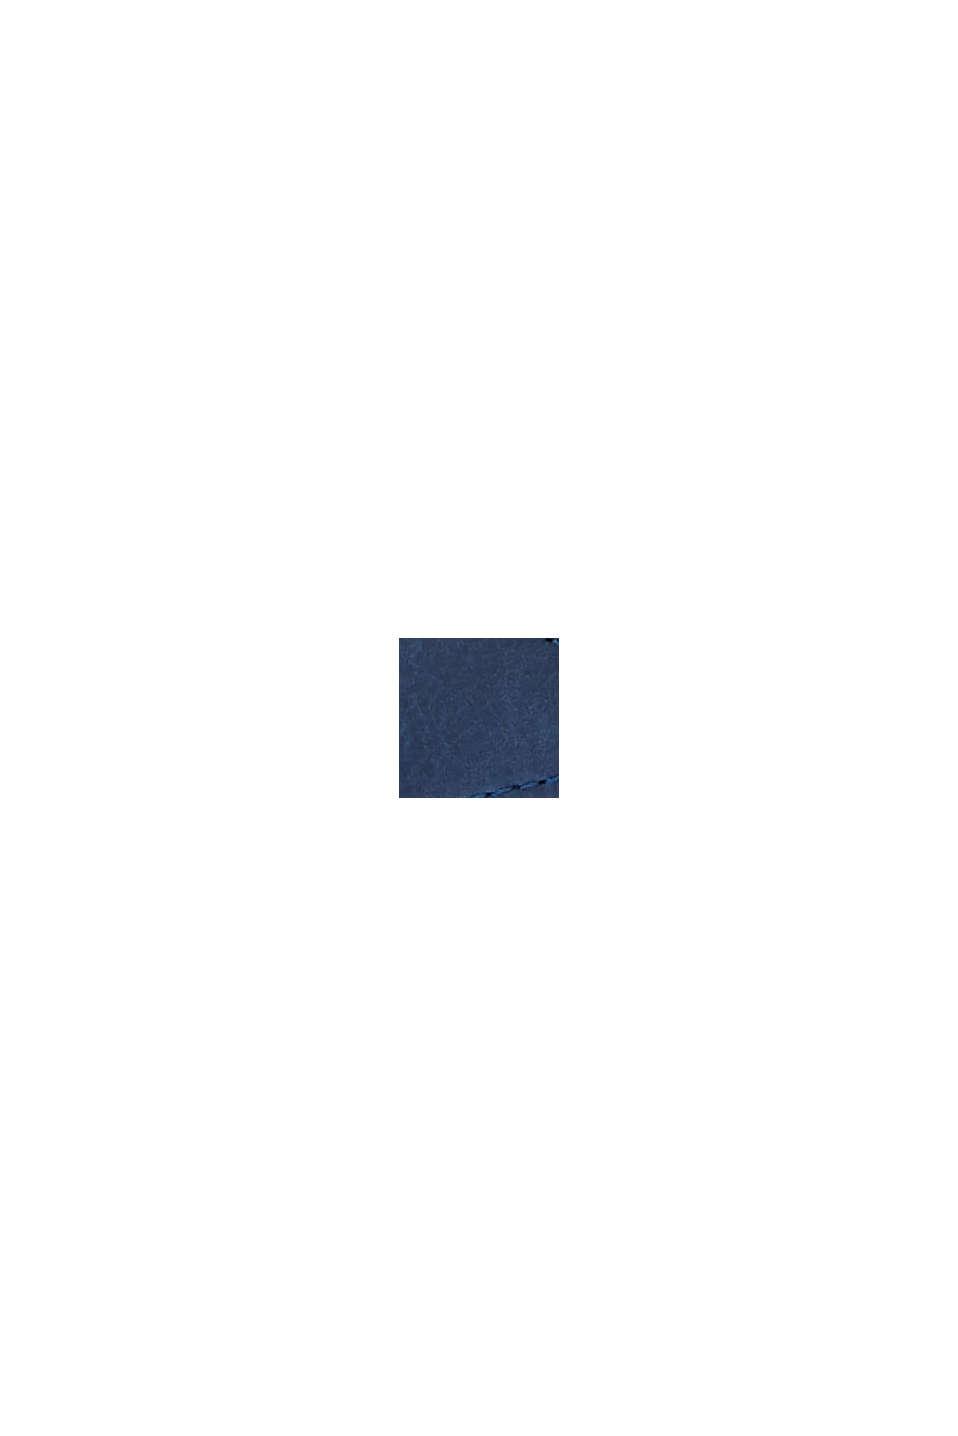 Sneakers en similicuir à semelle à plateau, DARK BLUE, swatch